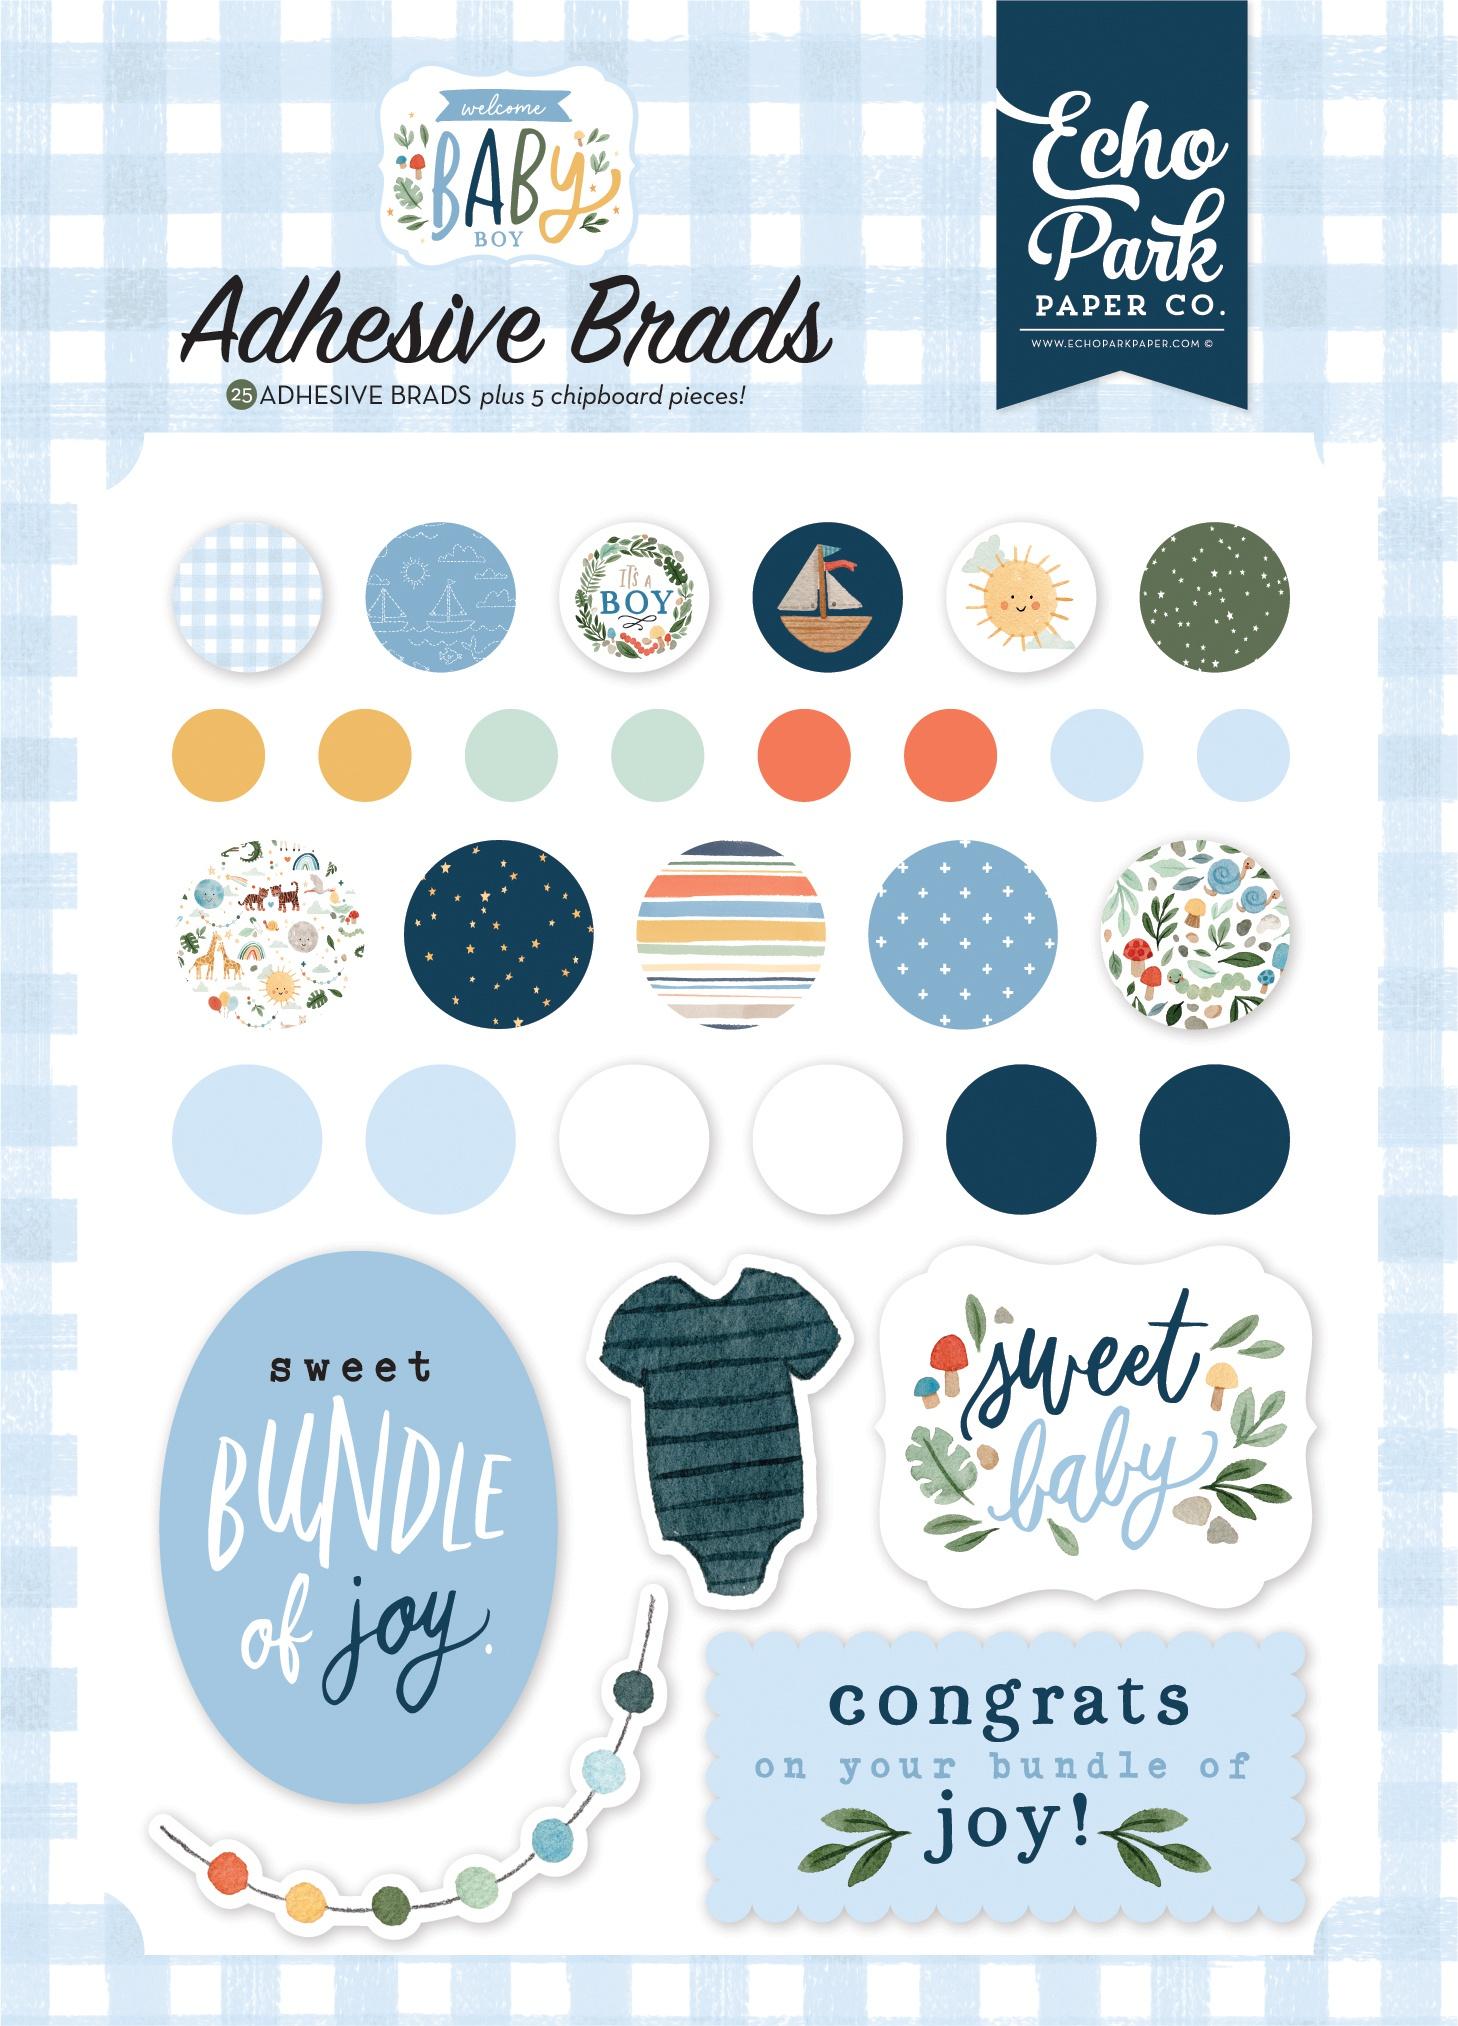 Echo Park - Welcome Baby Boy - Adhesive Brads